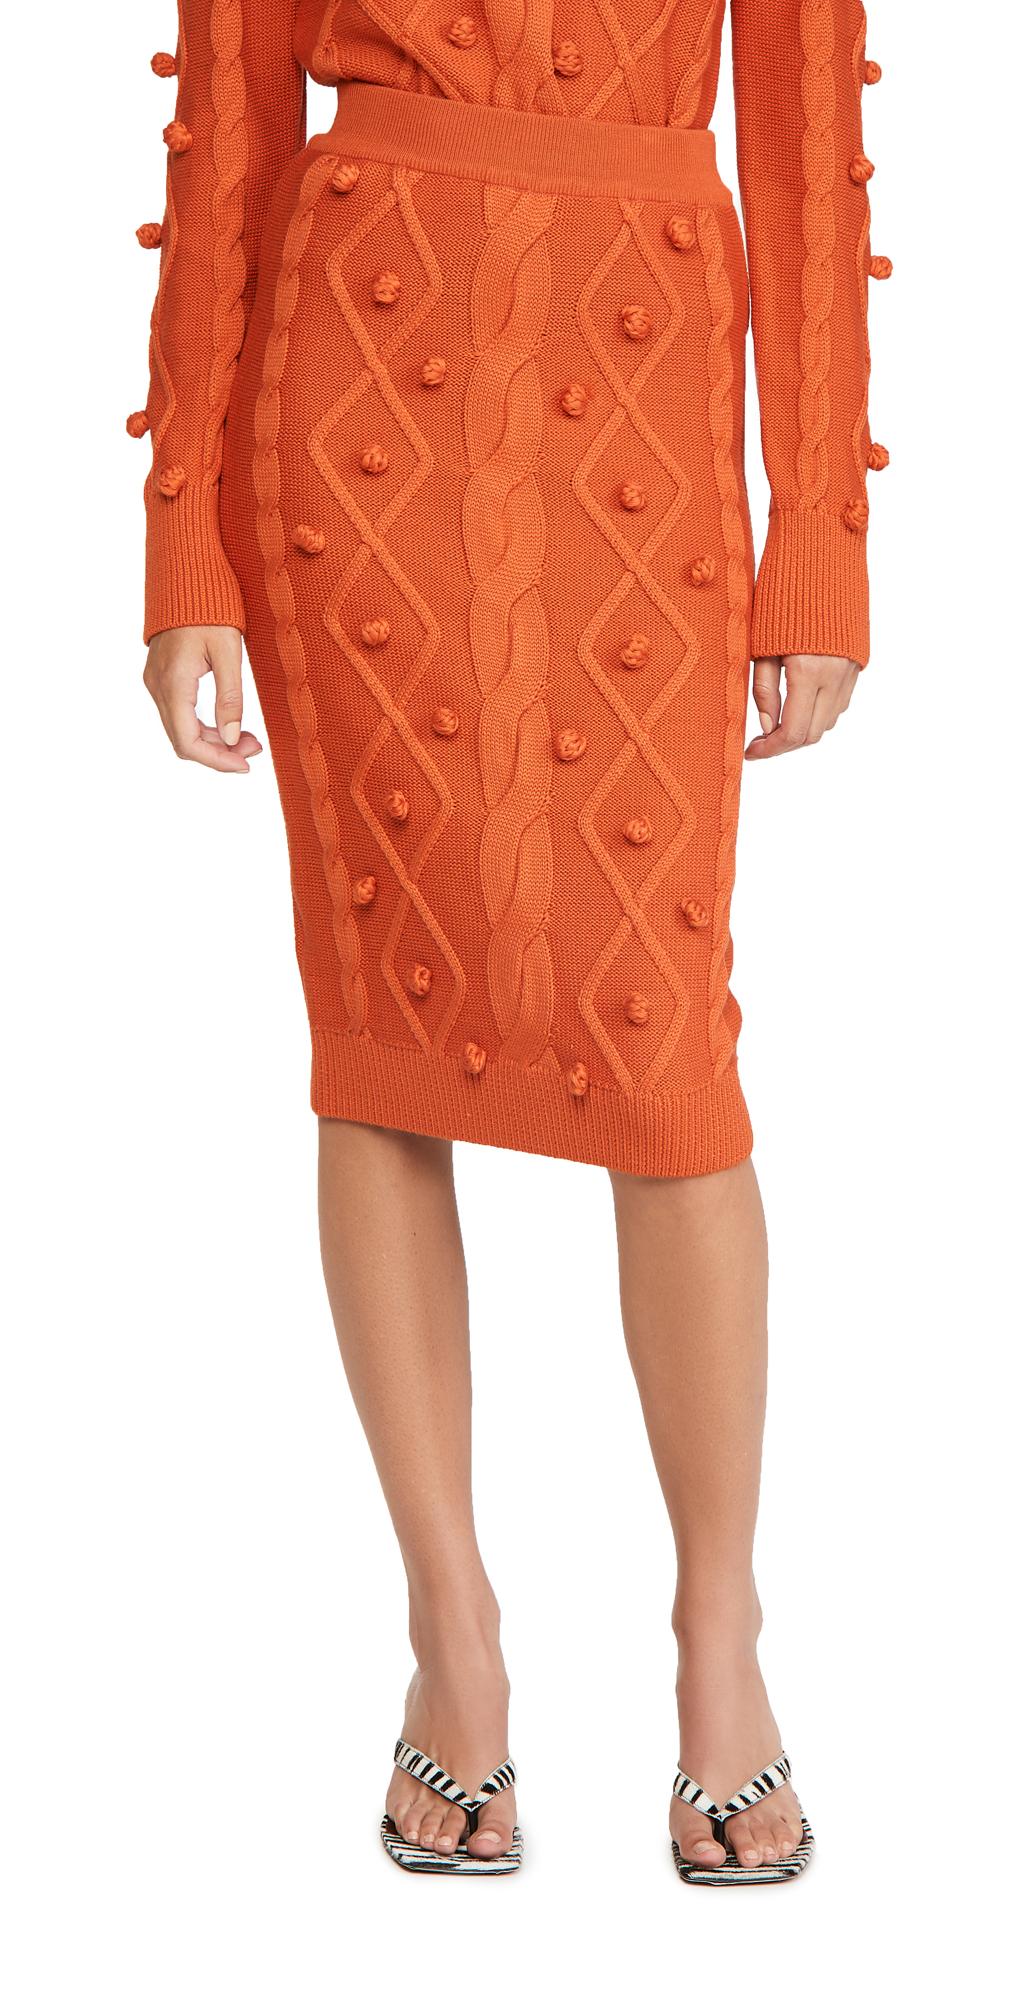 pushBUTTON Pom Pom Cable Knit Skirt